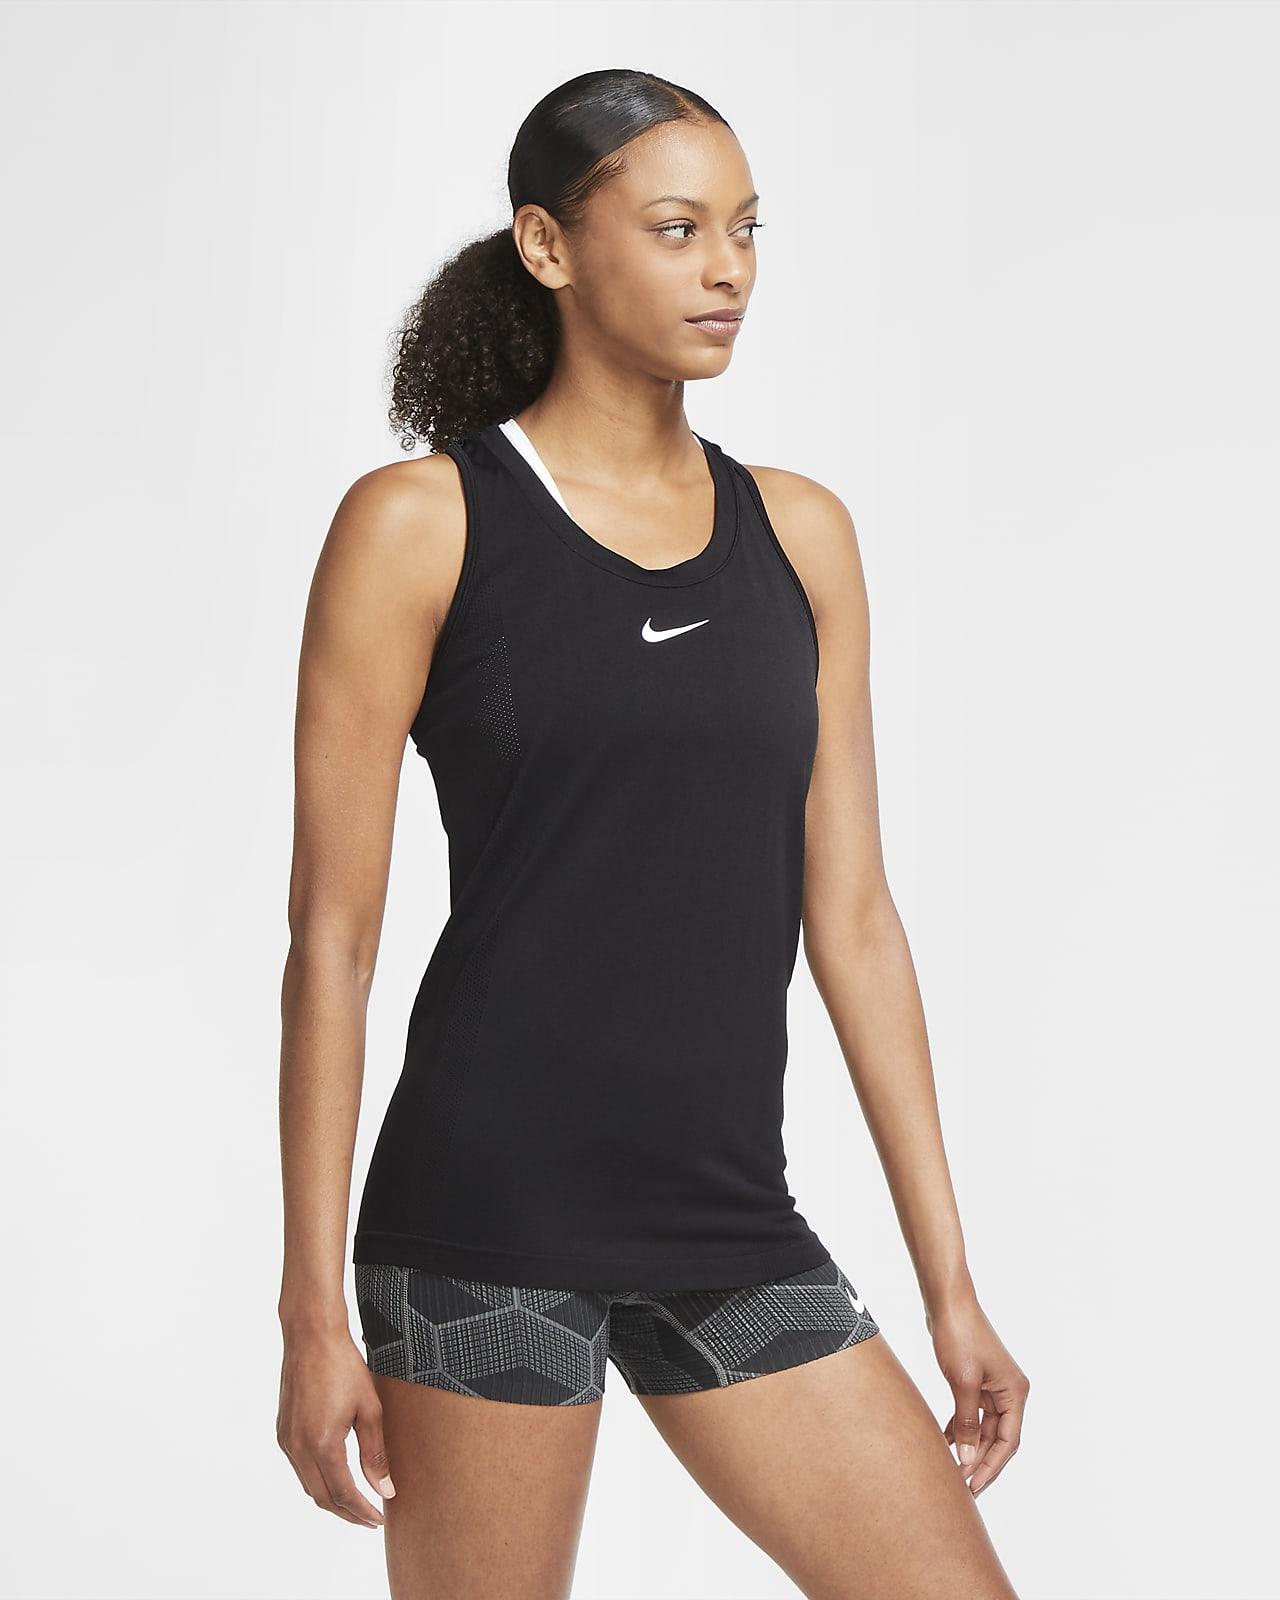 Débardeur de running Nike Infinite pour Femme